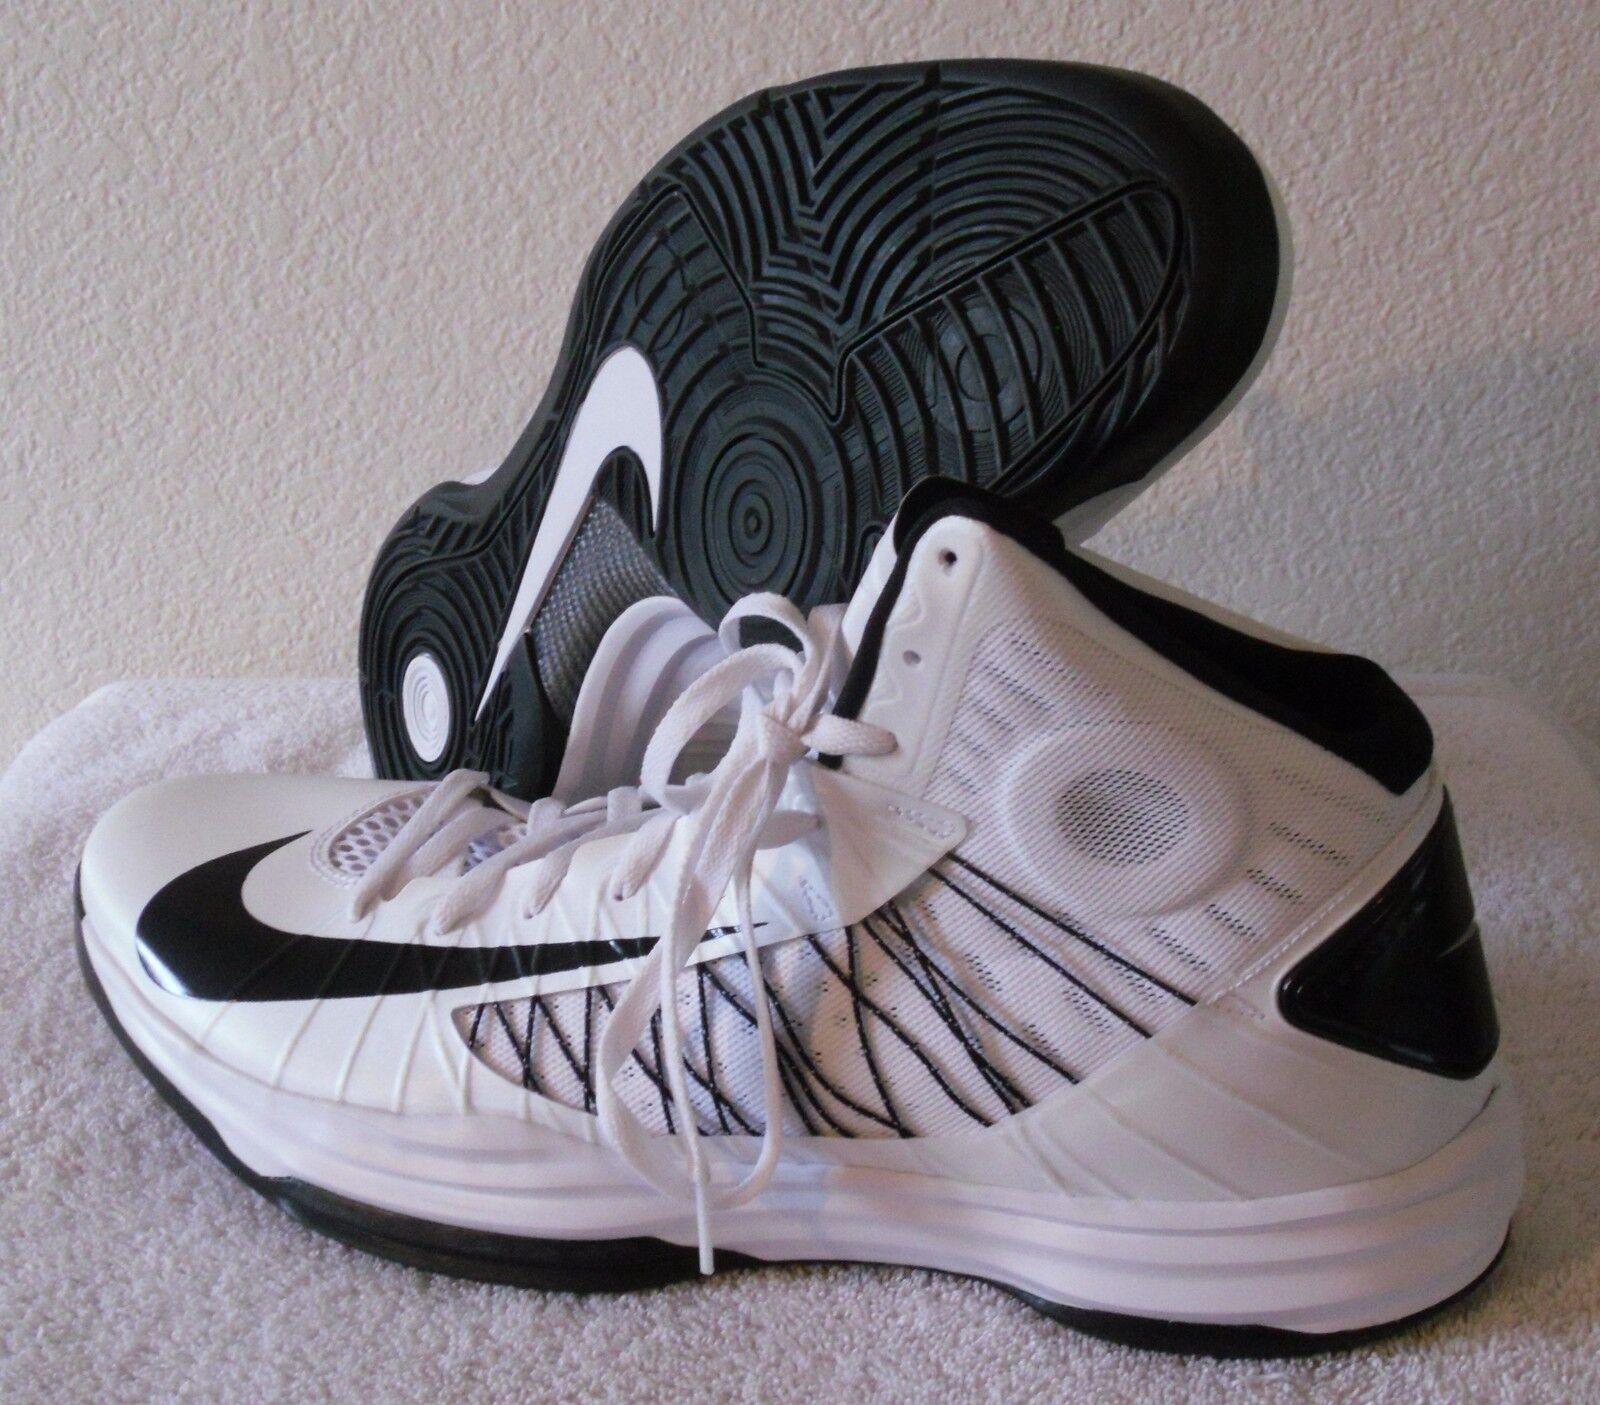 NEW Nike Hyperdunk TB hommes Basketball Chaussures 125 18 blanc/ noir MSRP 125 Chaussures 6dab2c